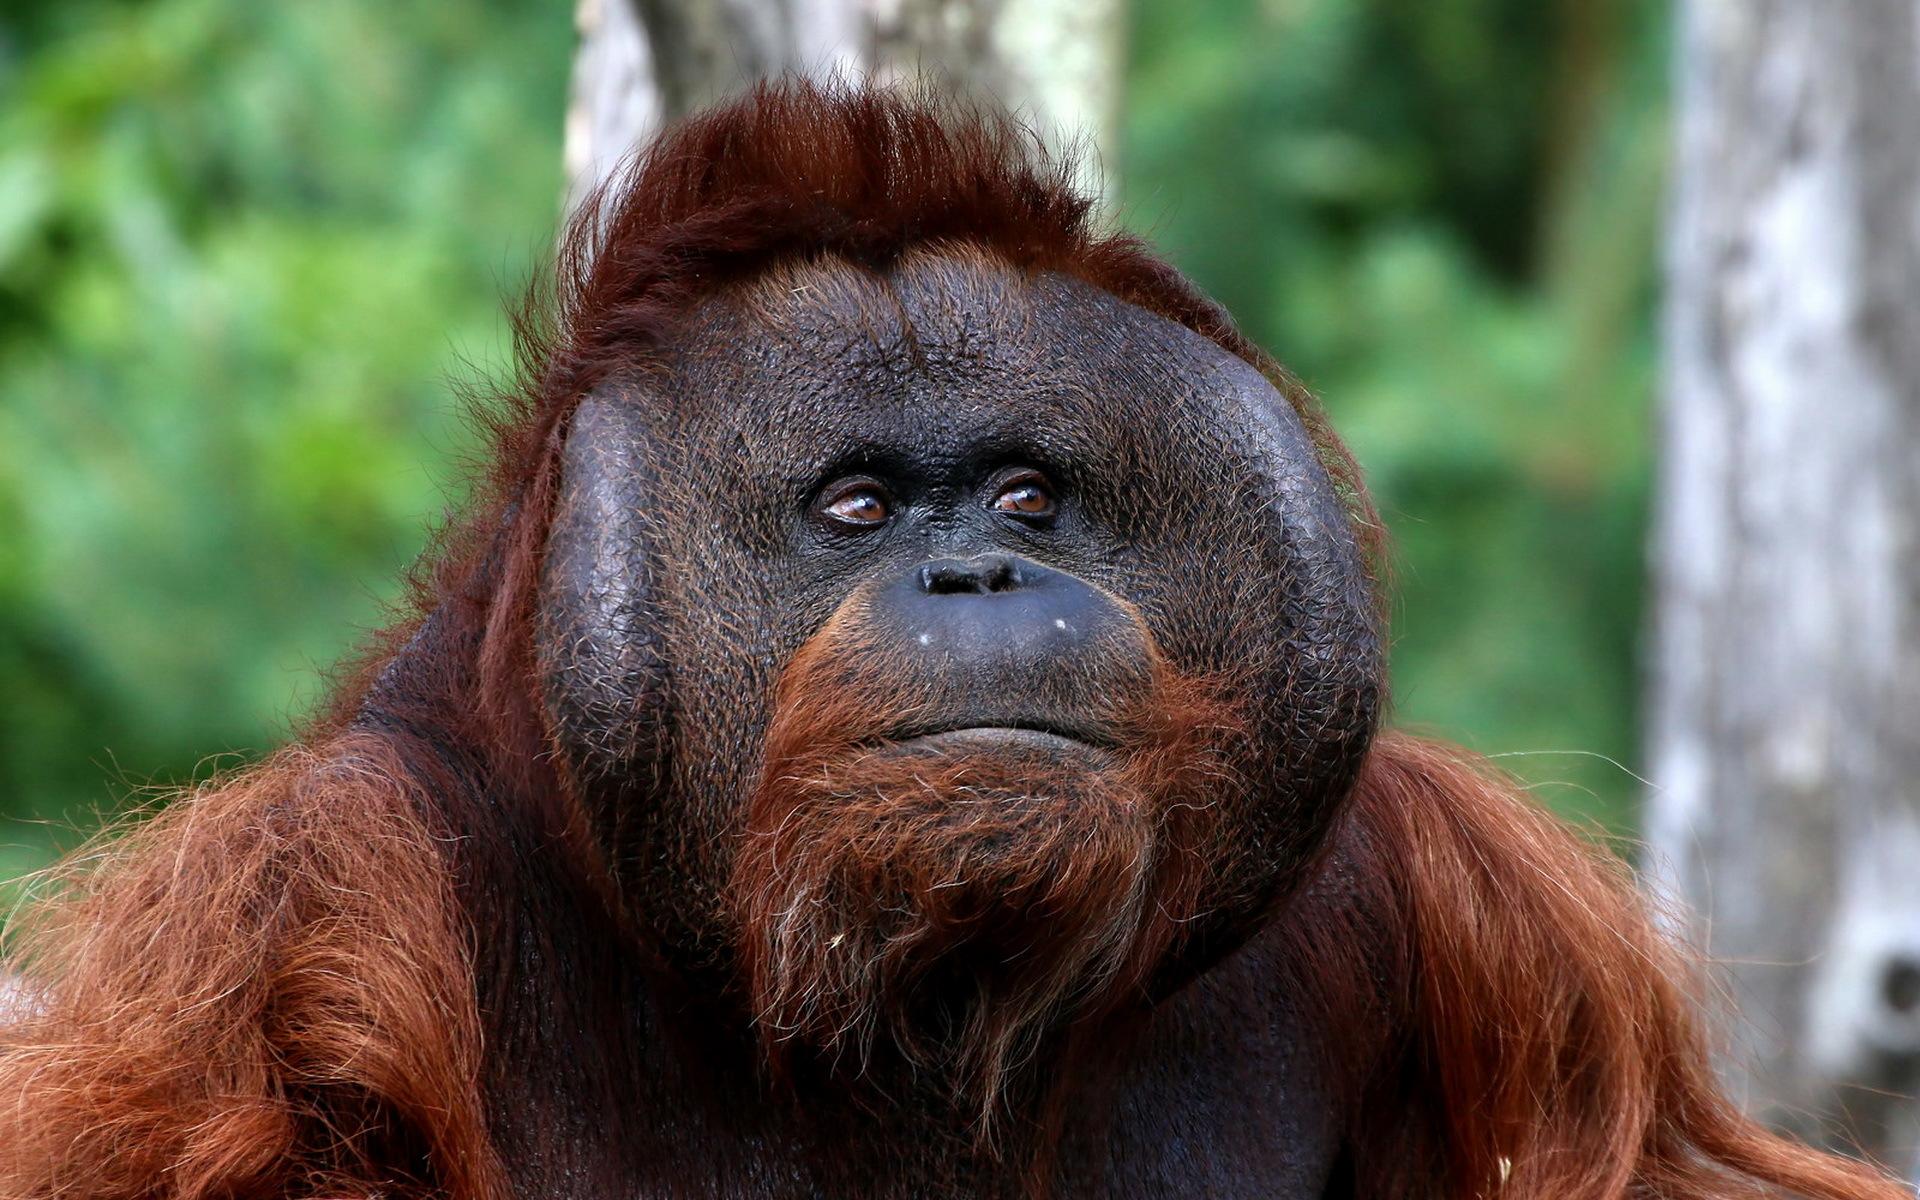 Orangutan Hd Wallpaper Background Image 1920x1200 Id766847